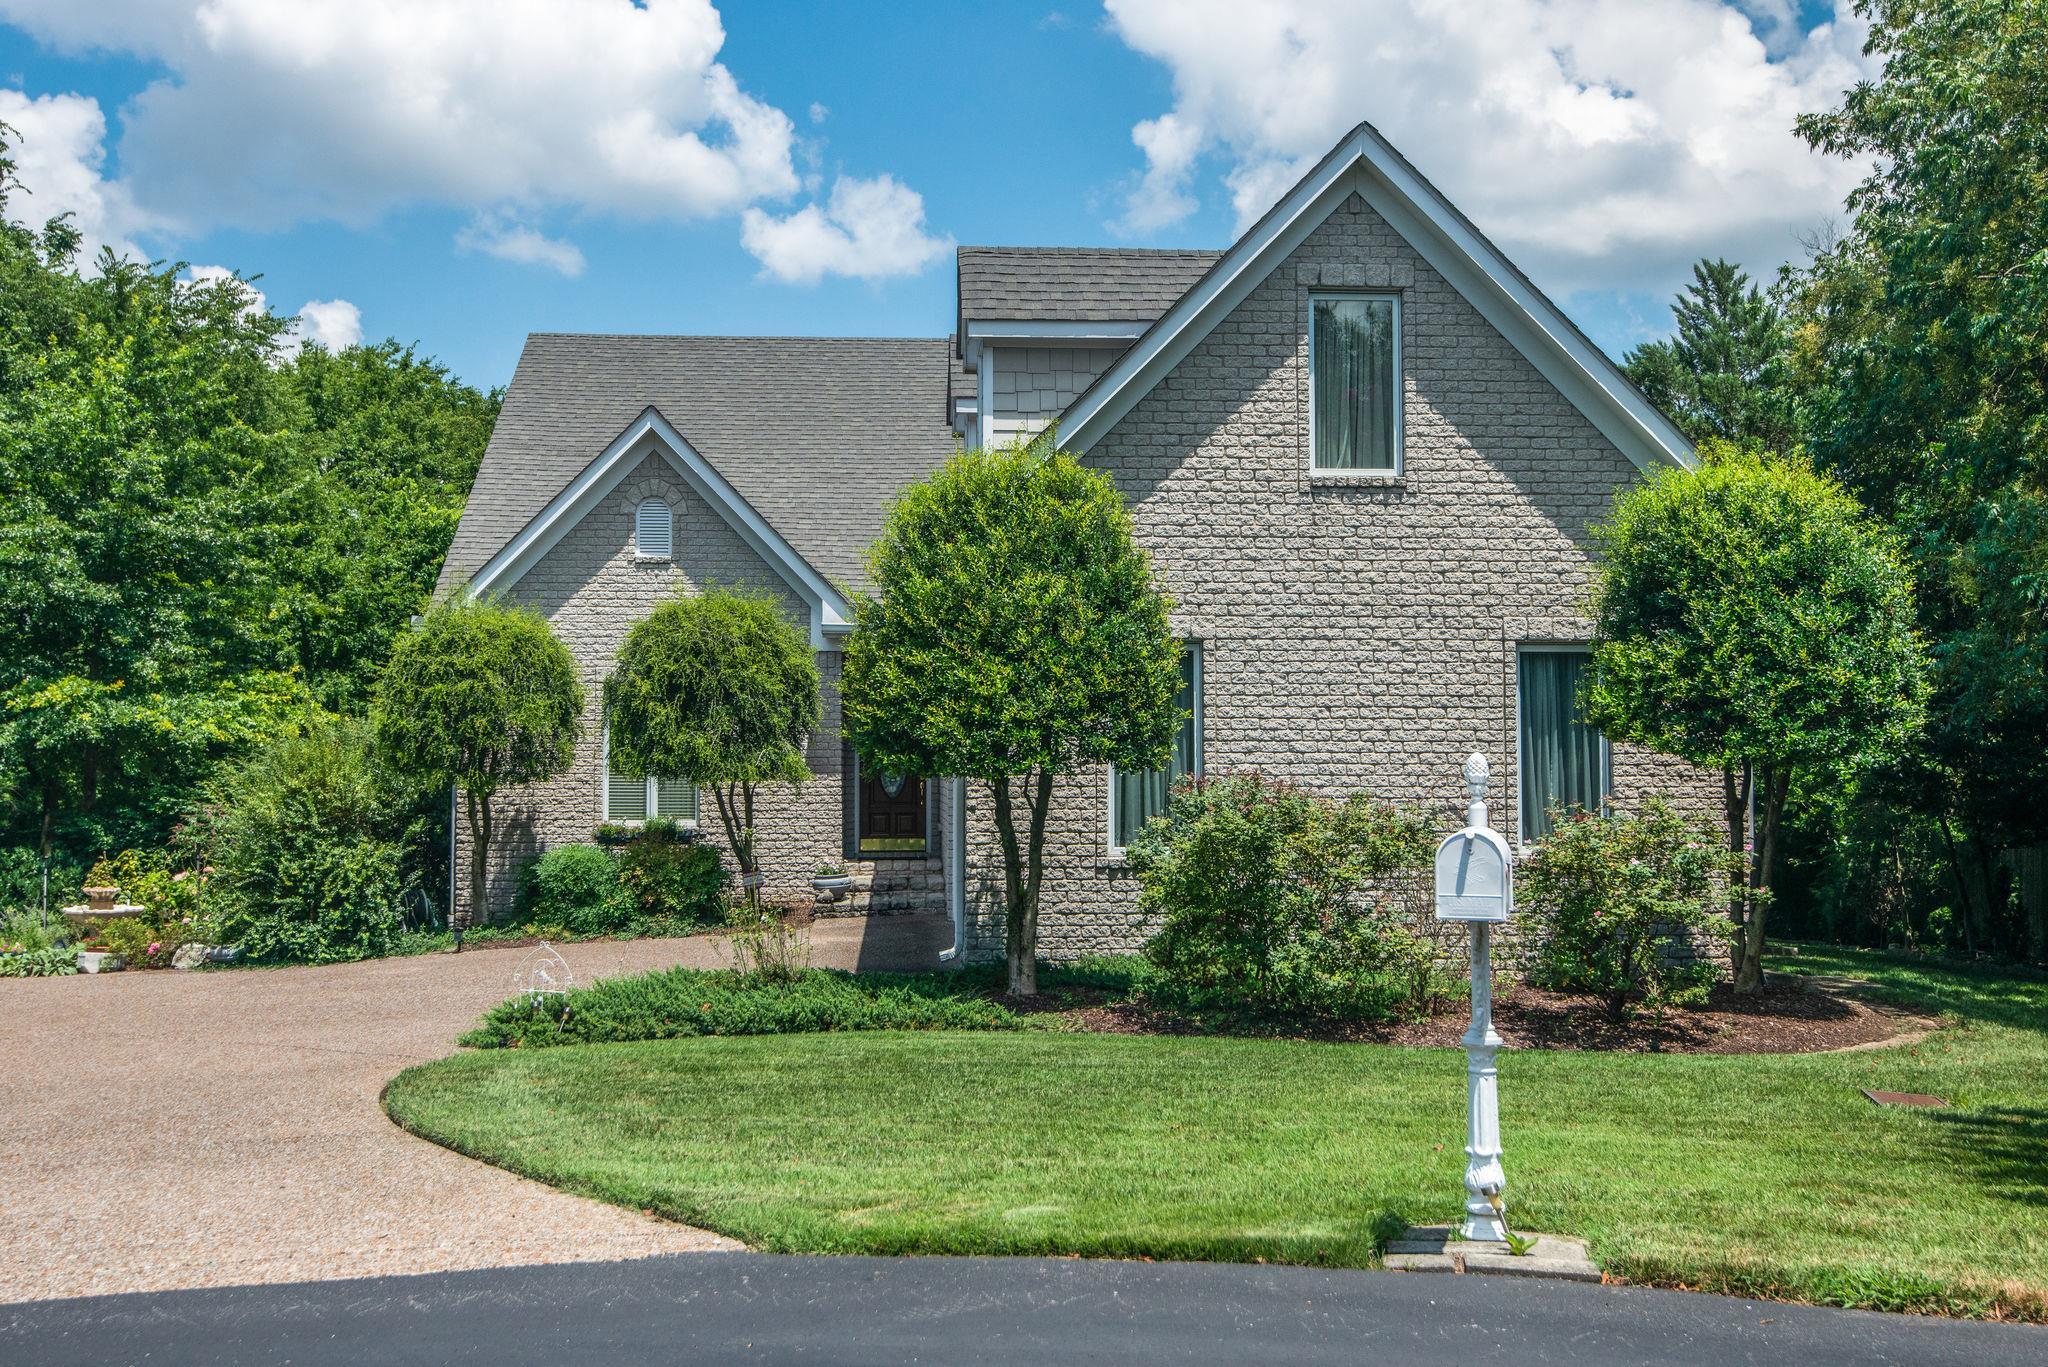 746 Peach Orchard Dr, Nashville, TN 37204 - Nashville, TN real estate listing